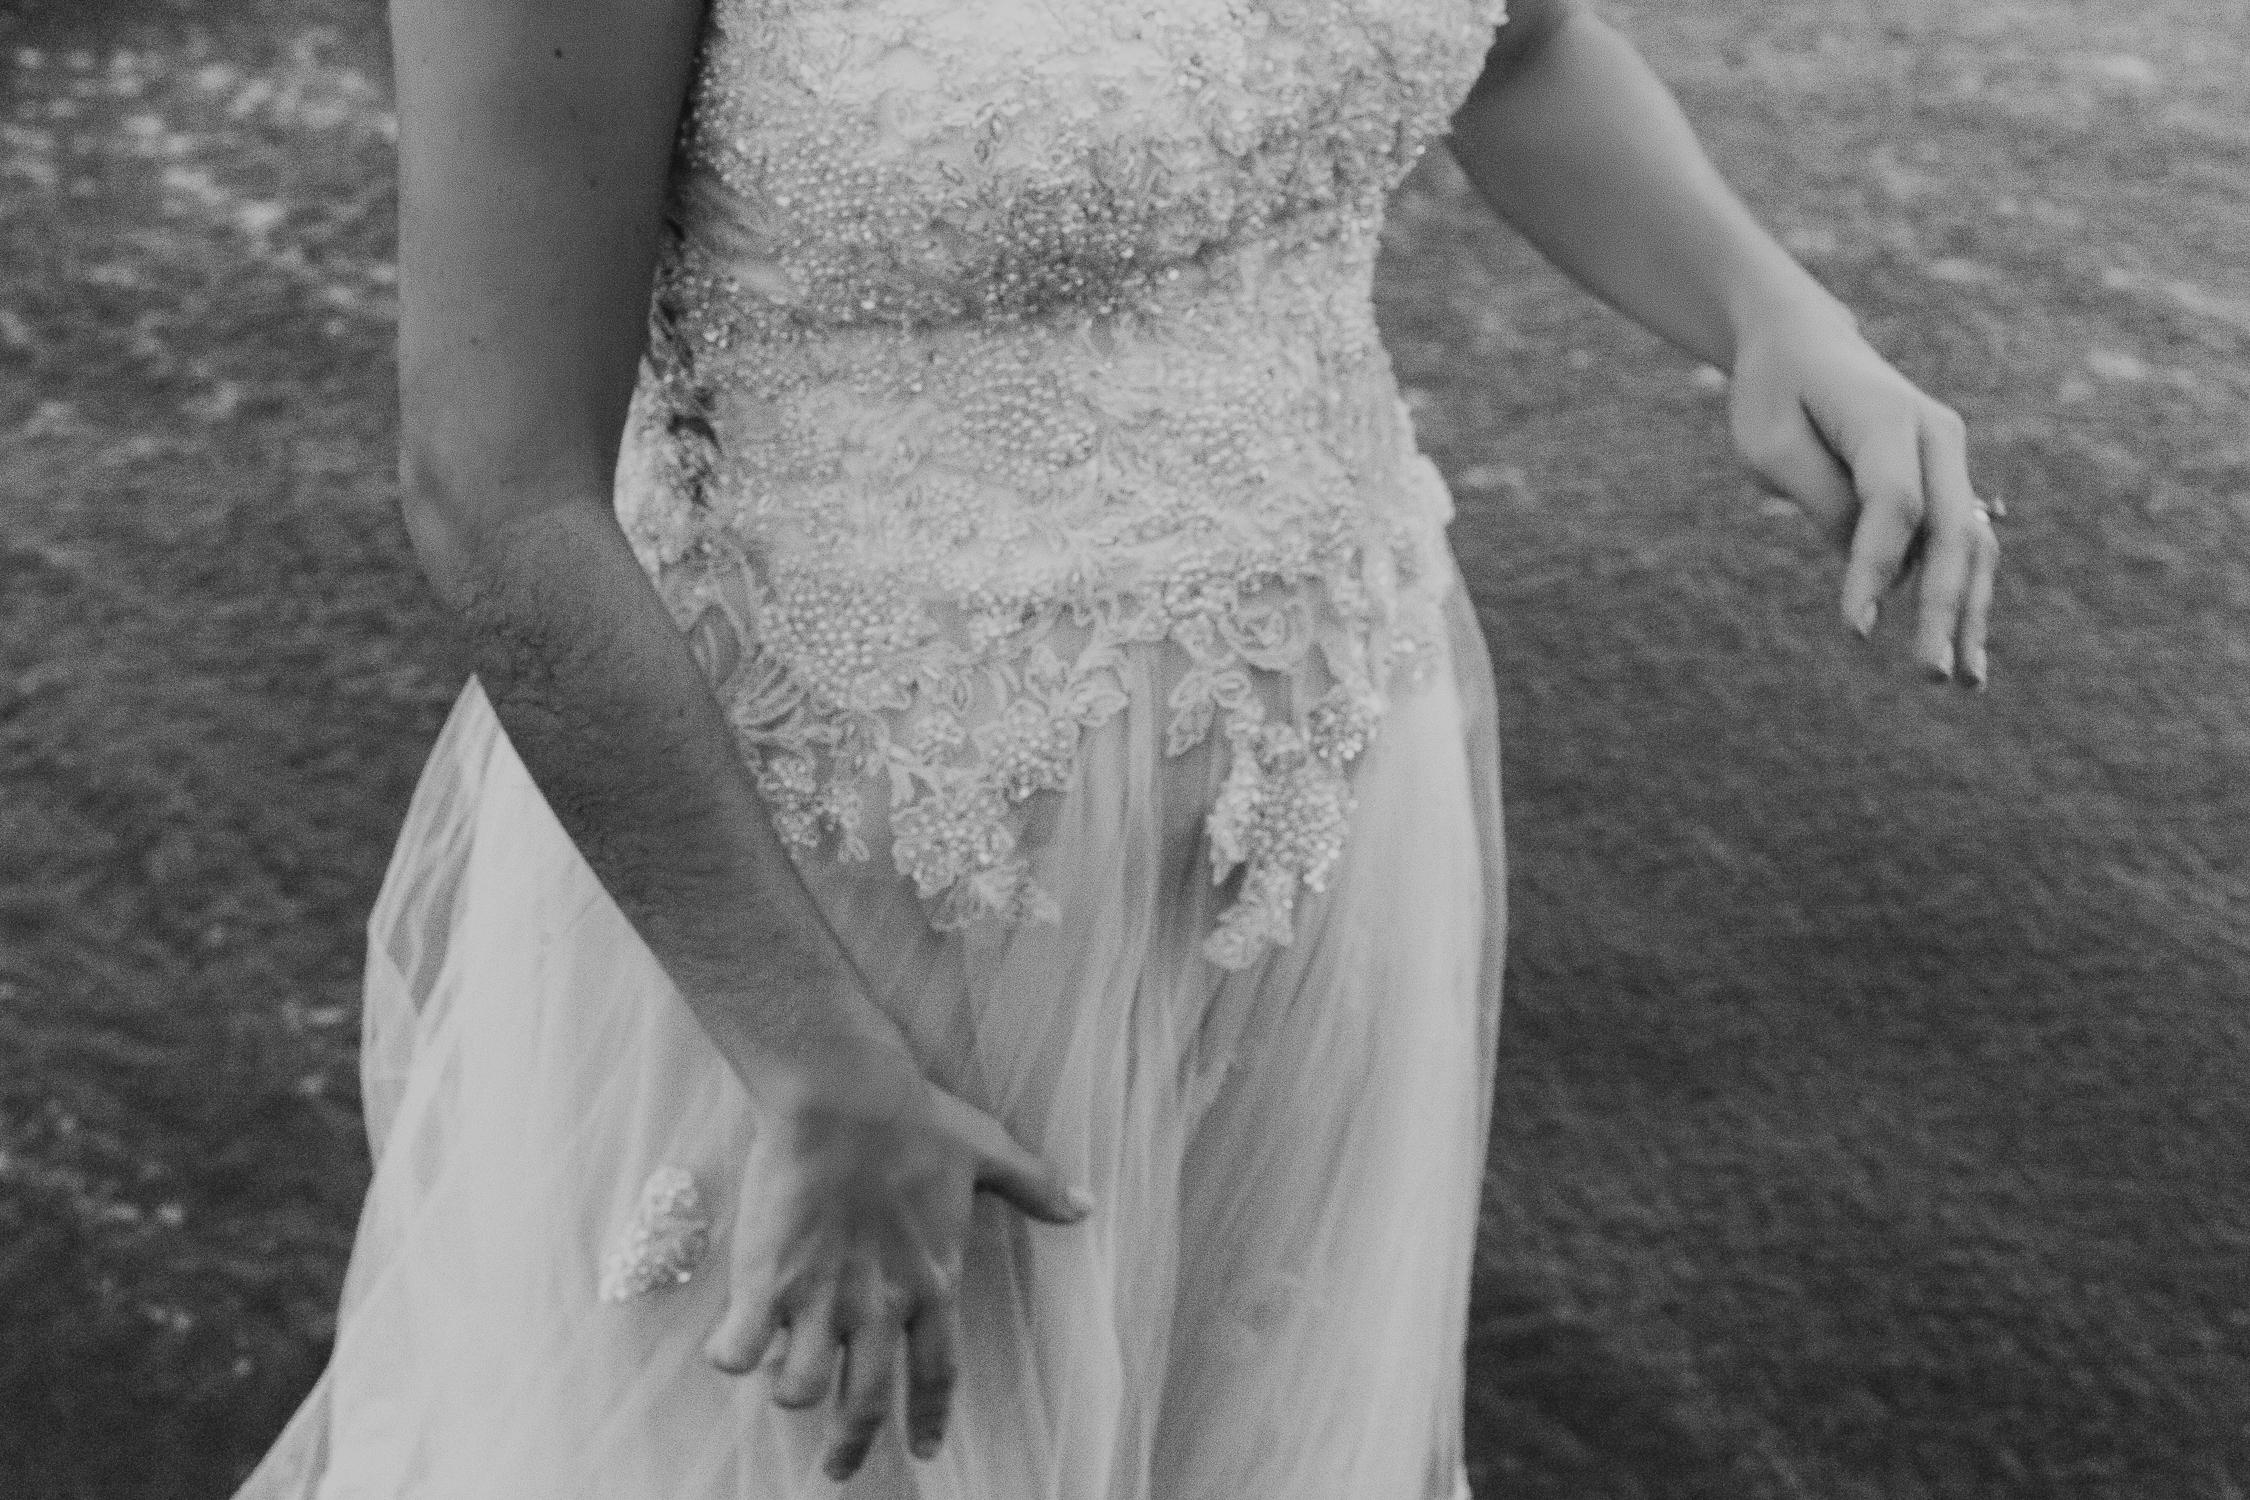 Michelle-Agurto-Fotografia-Bodas-Ecuador-Destination-Wedding-Photographer-Gabriela-Gabriel-34.JPG